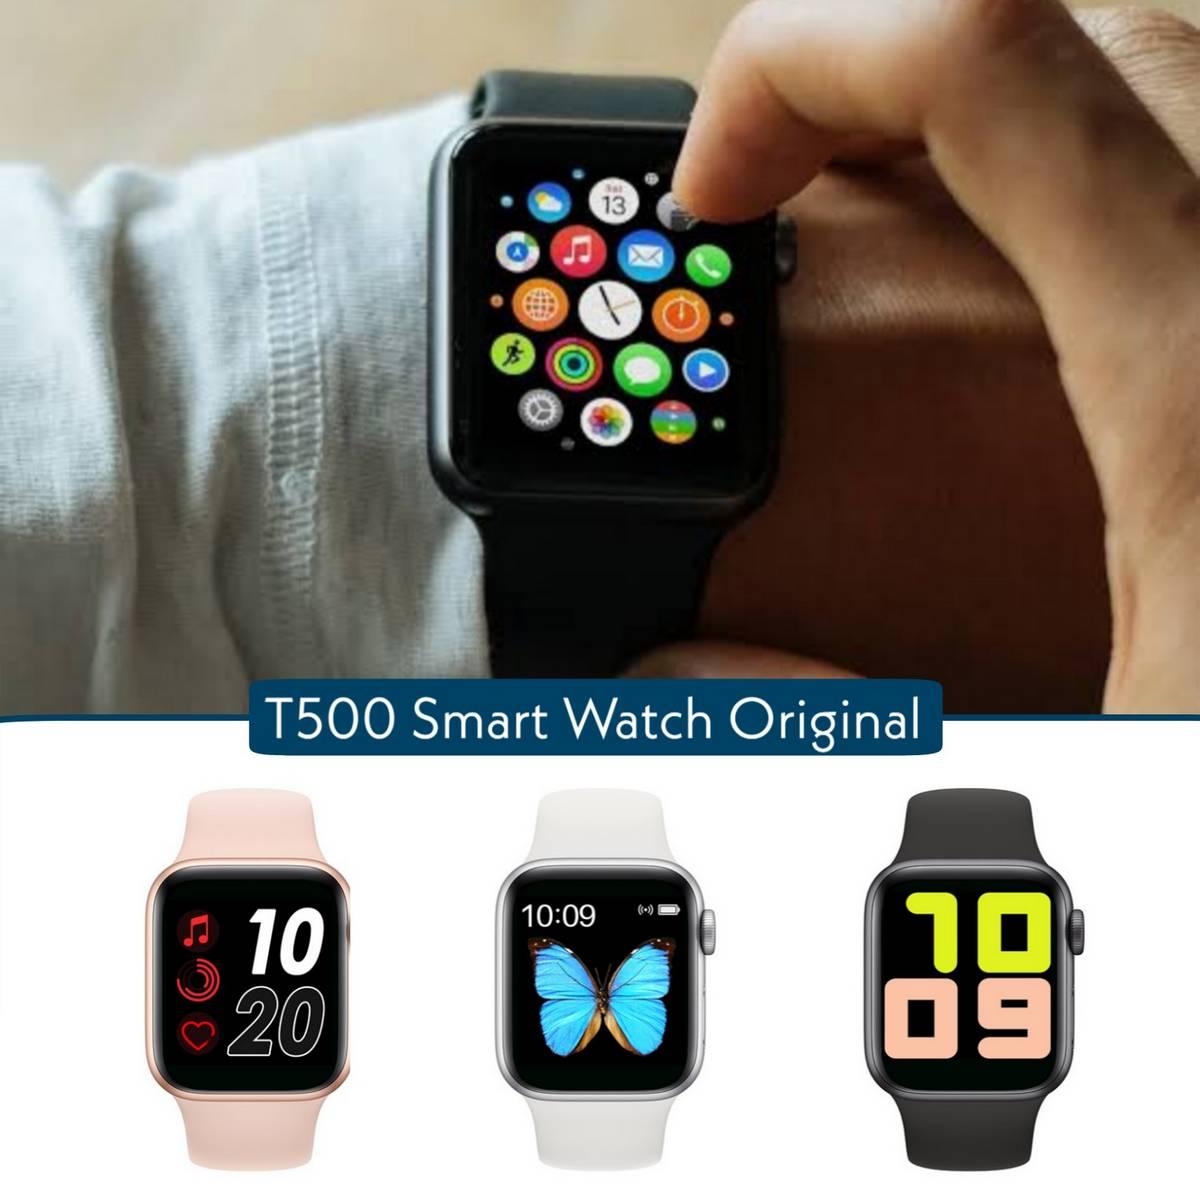 T500 Bluetooth Smart Watch Bluetooth call Player Fitness Tracking Smartwatch